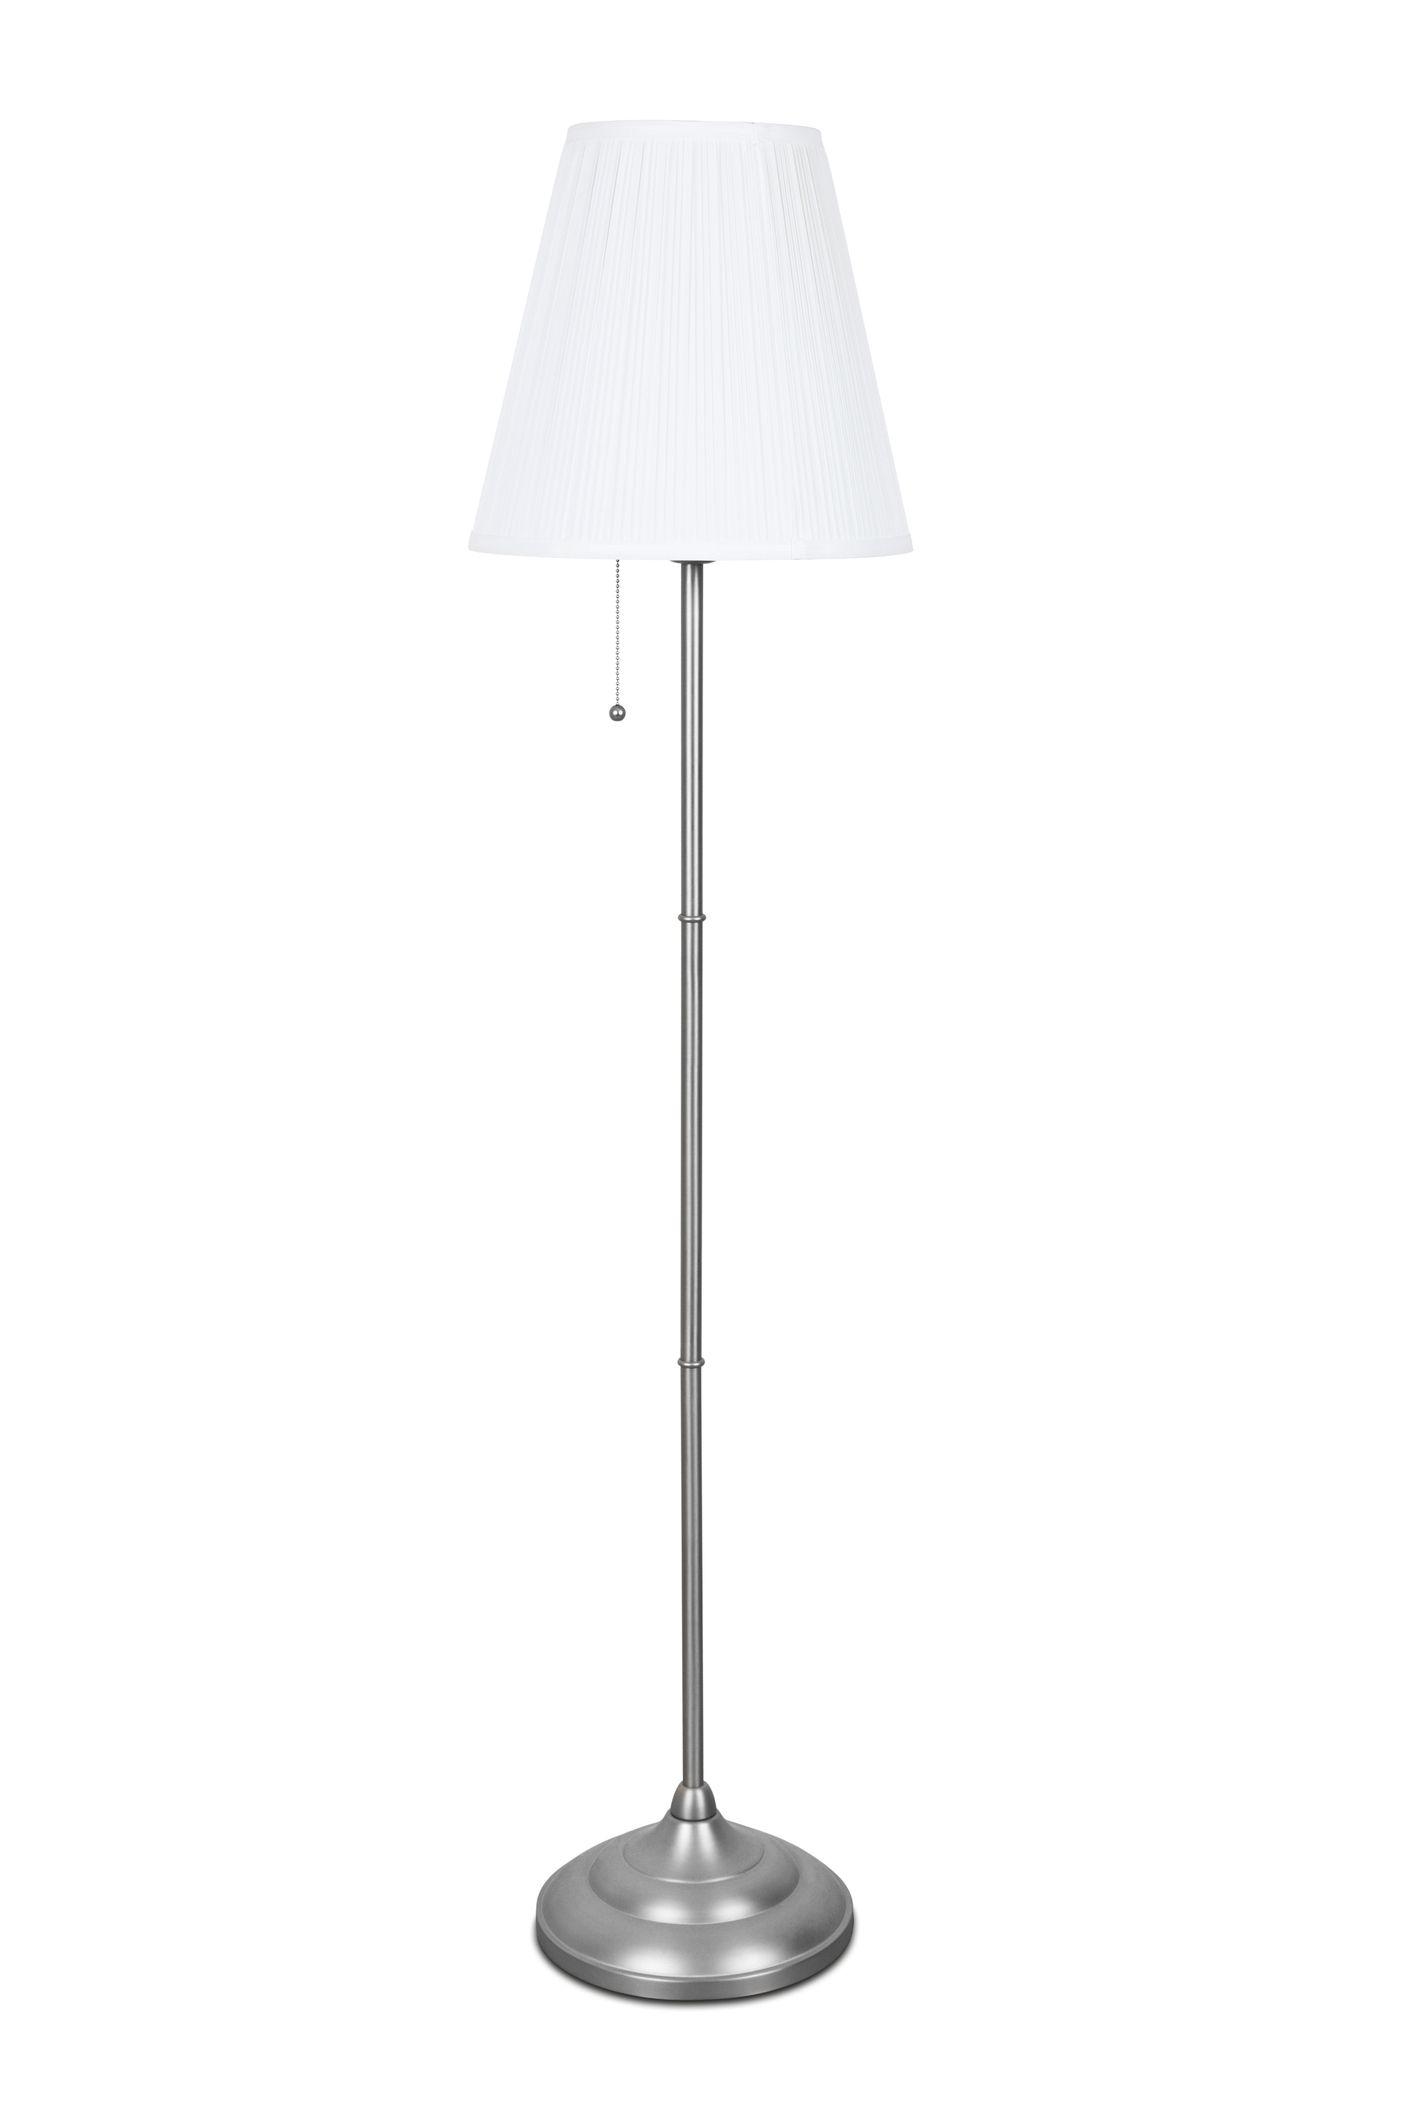 different types of floor lamps. Black Bedroom Furniture Sets. Home Design Ideas